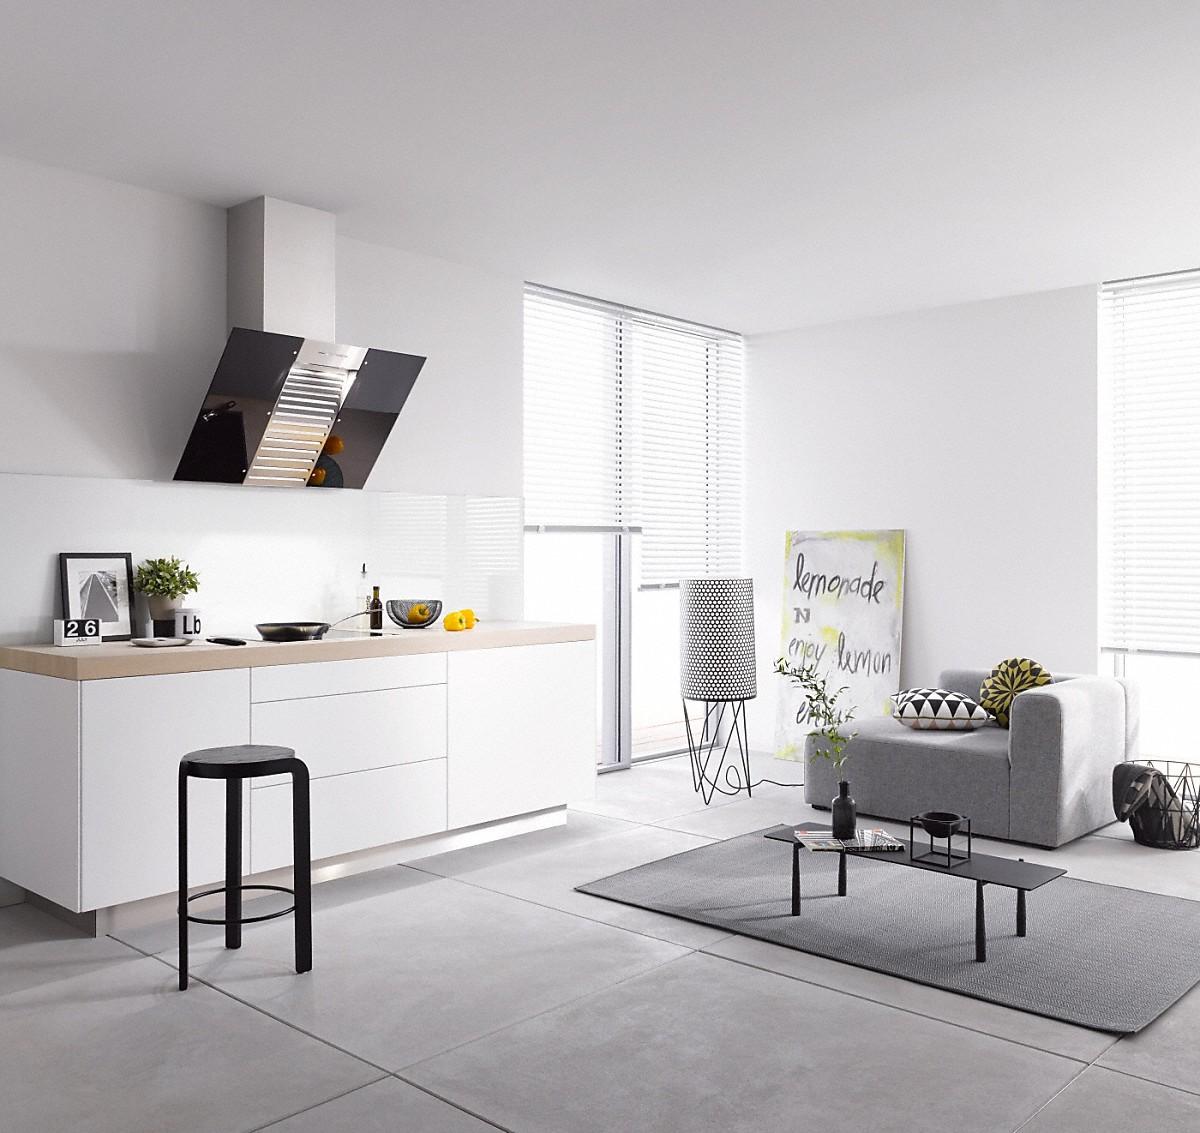 miele da 6096 w wing wand dunstabzugshaube. Black Bedroom Furniture Sets. Home Design Ideas